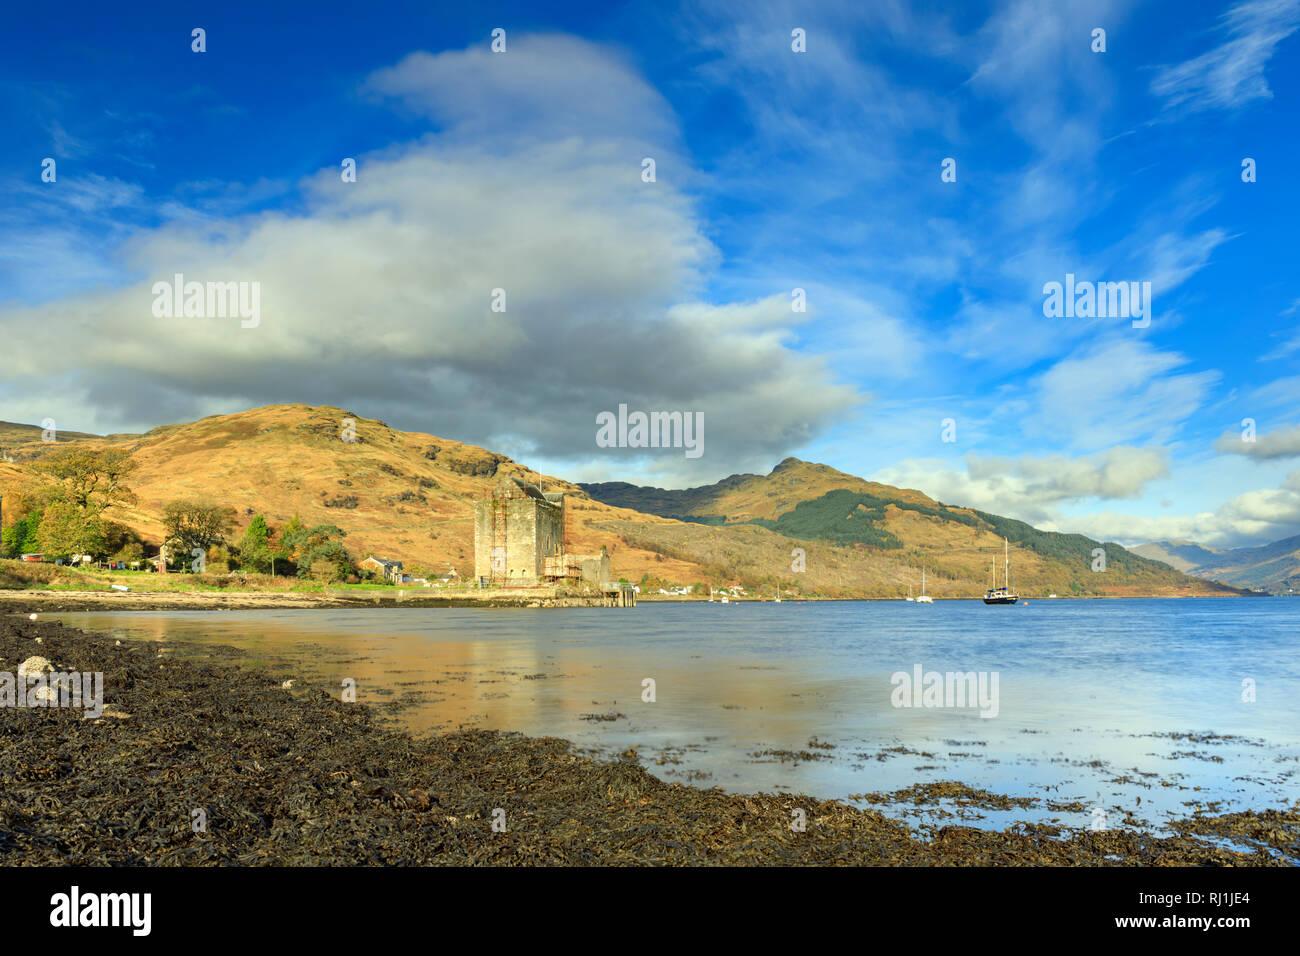 Carrick Castle on Loch Goil in Scotland. - Stock Image